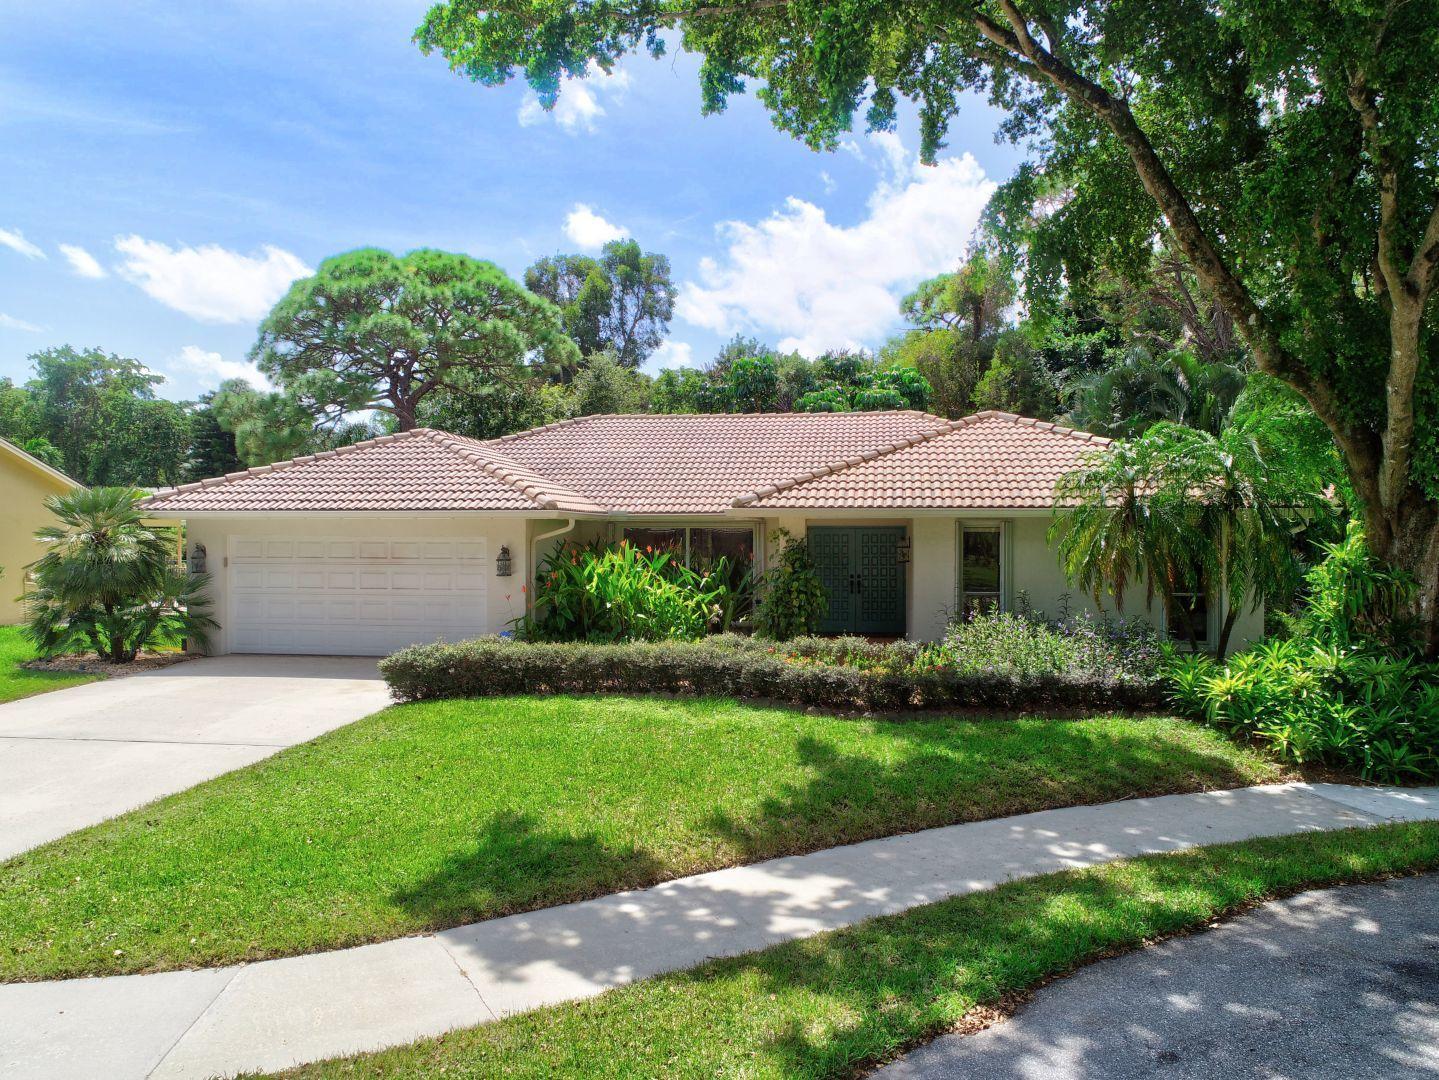 2422 Nw 36th Street Boca Raton, FL 33431